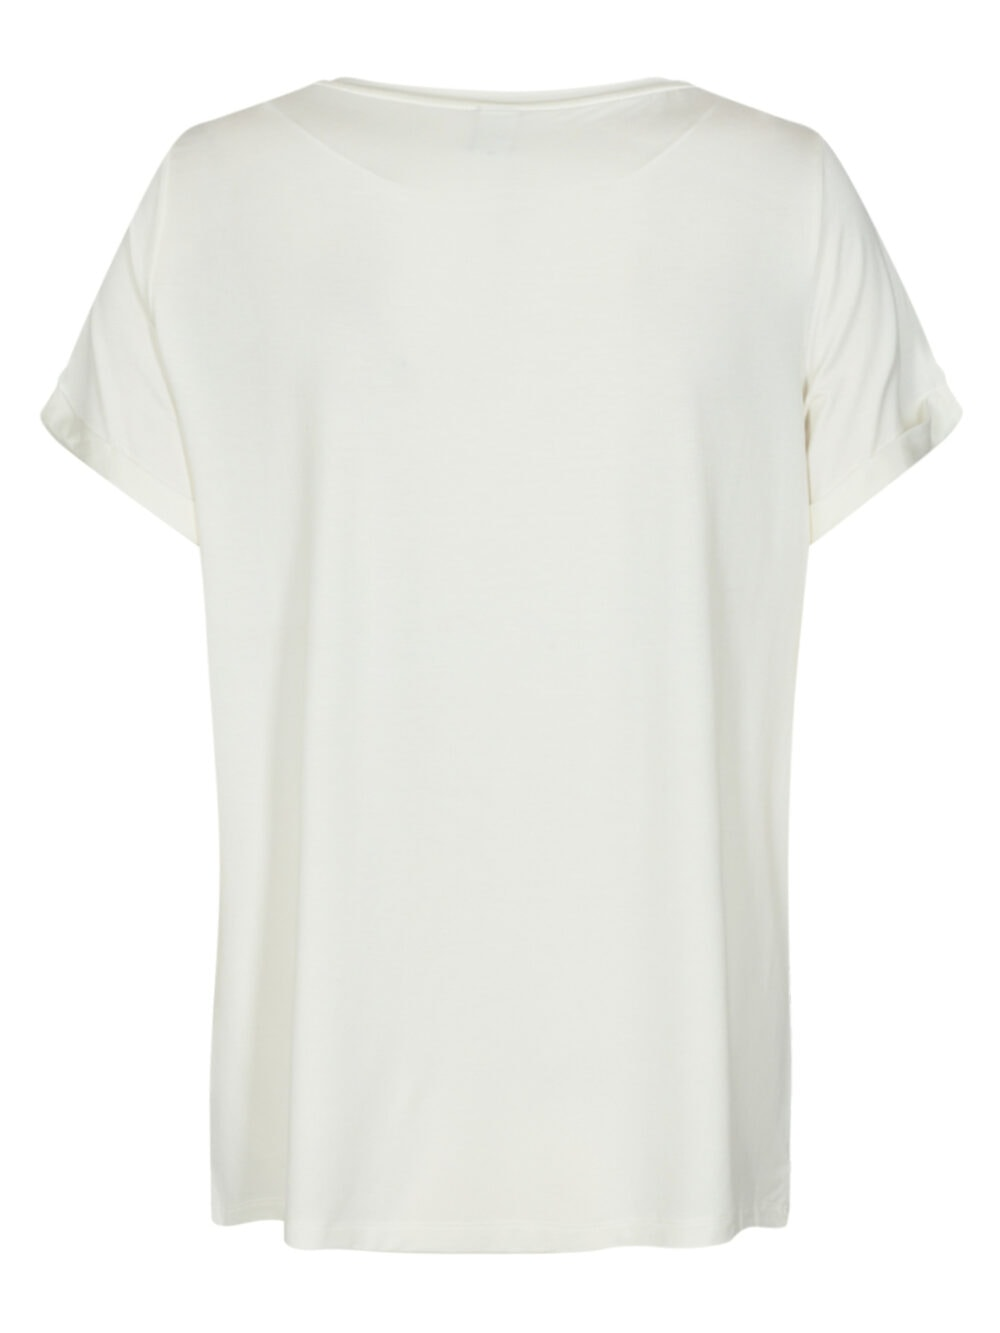 Soyaconcept Marica FP 131 T-shirt Hvid